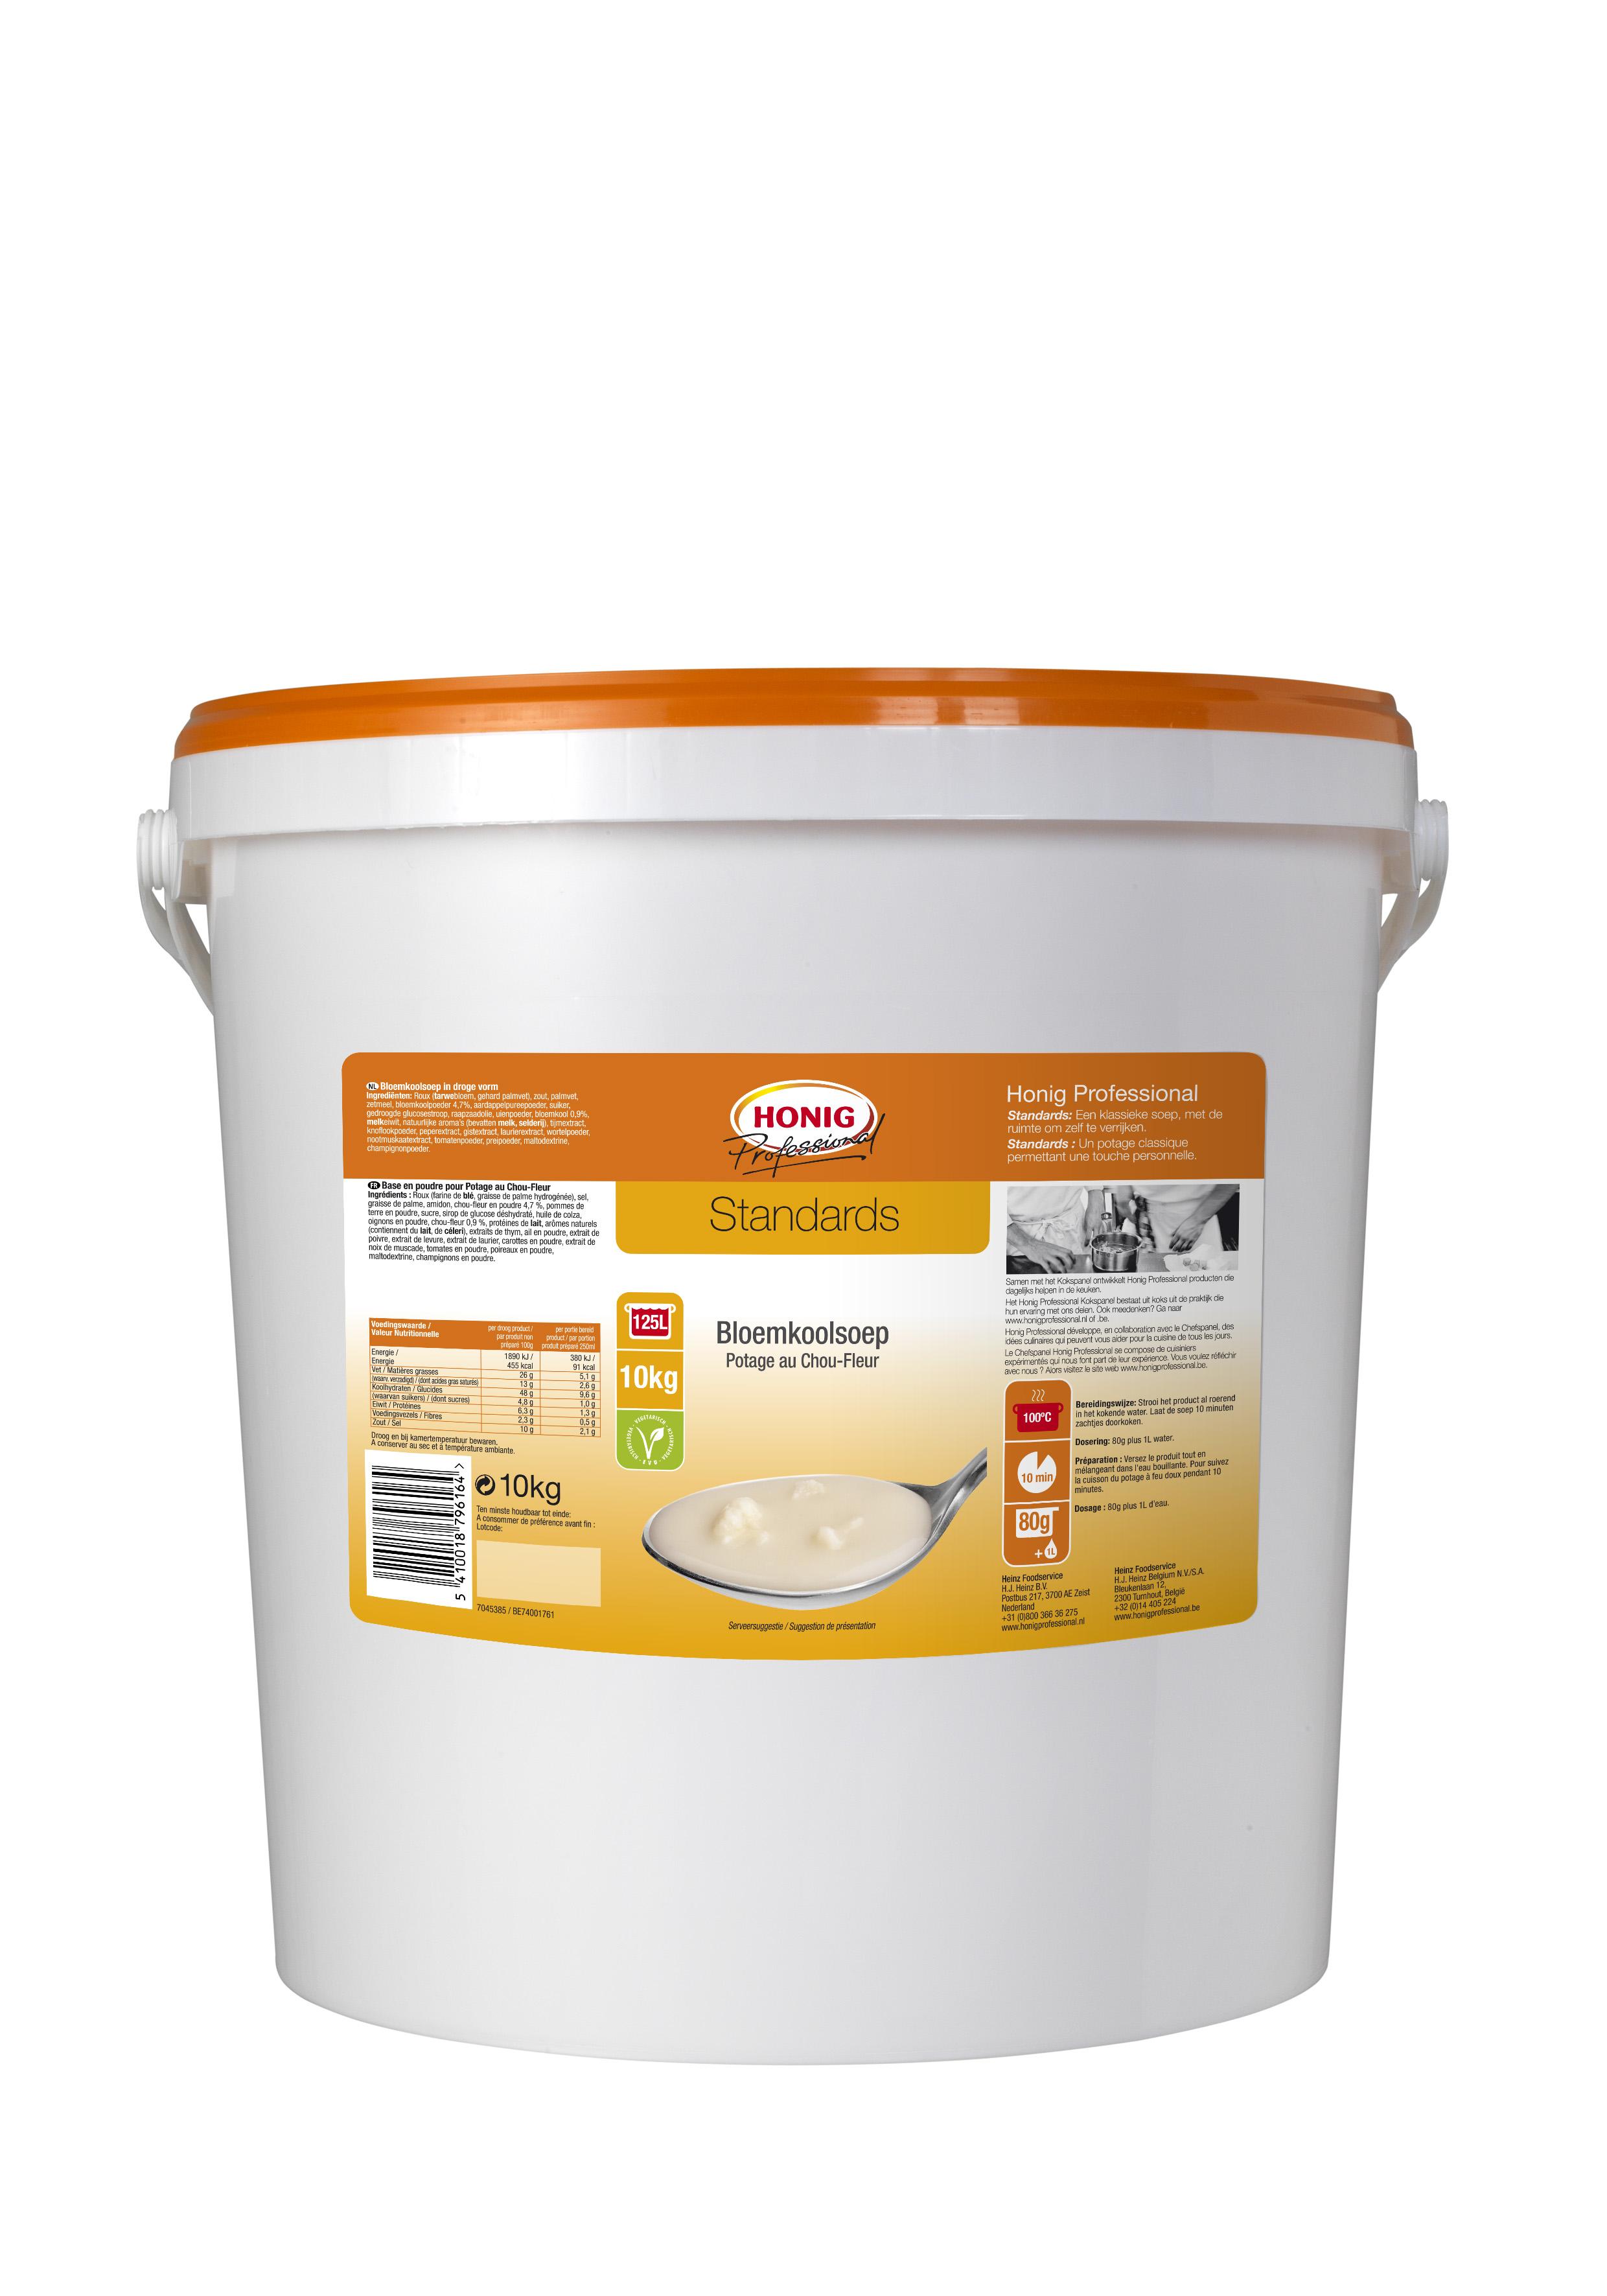 Honig For Professional Potage Au Chou-Fleur 10L image